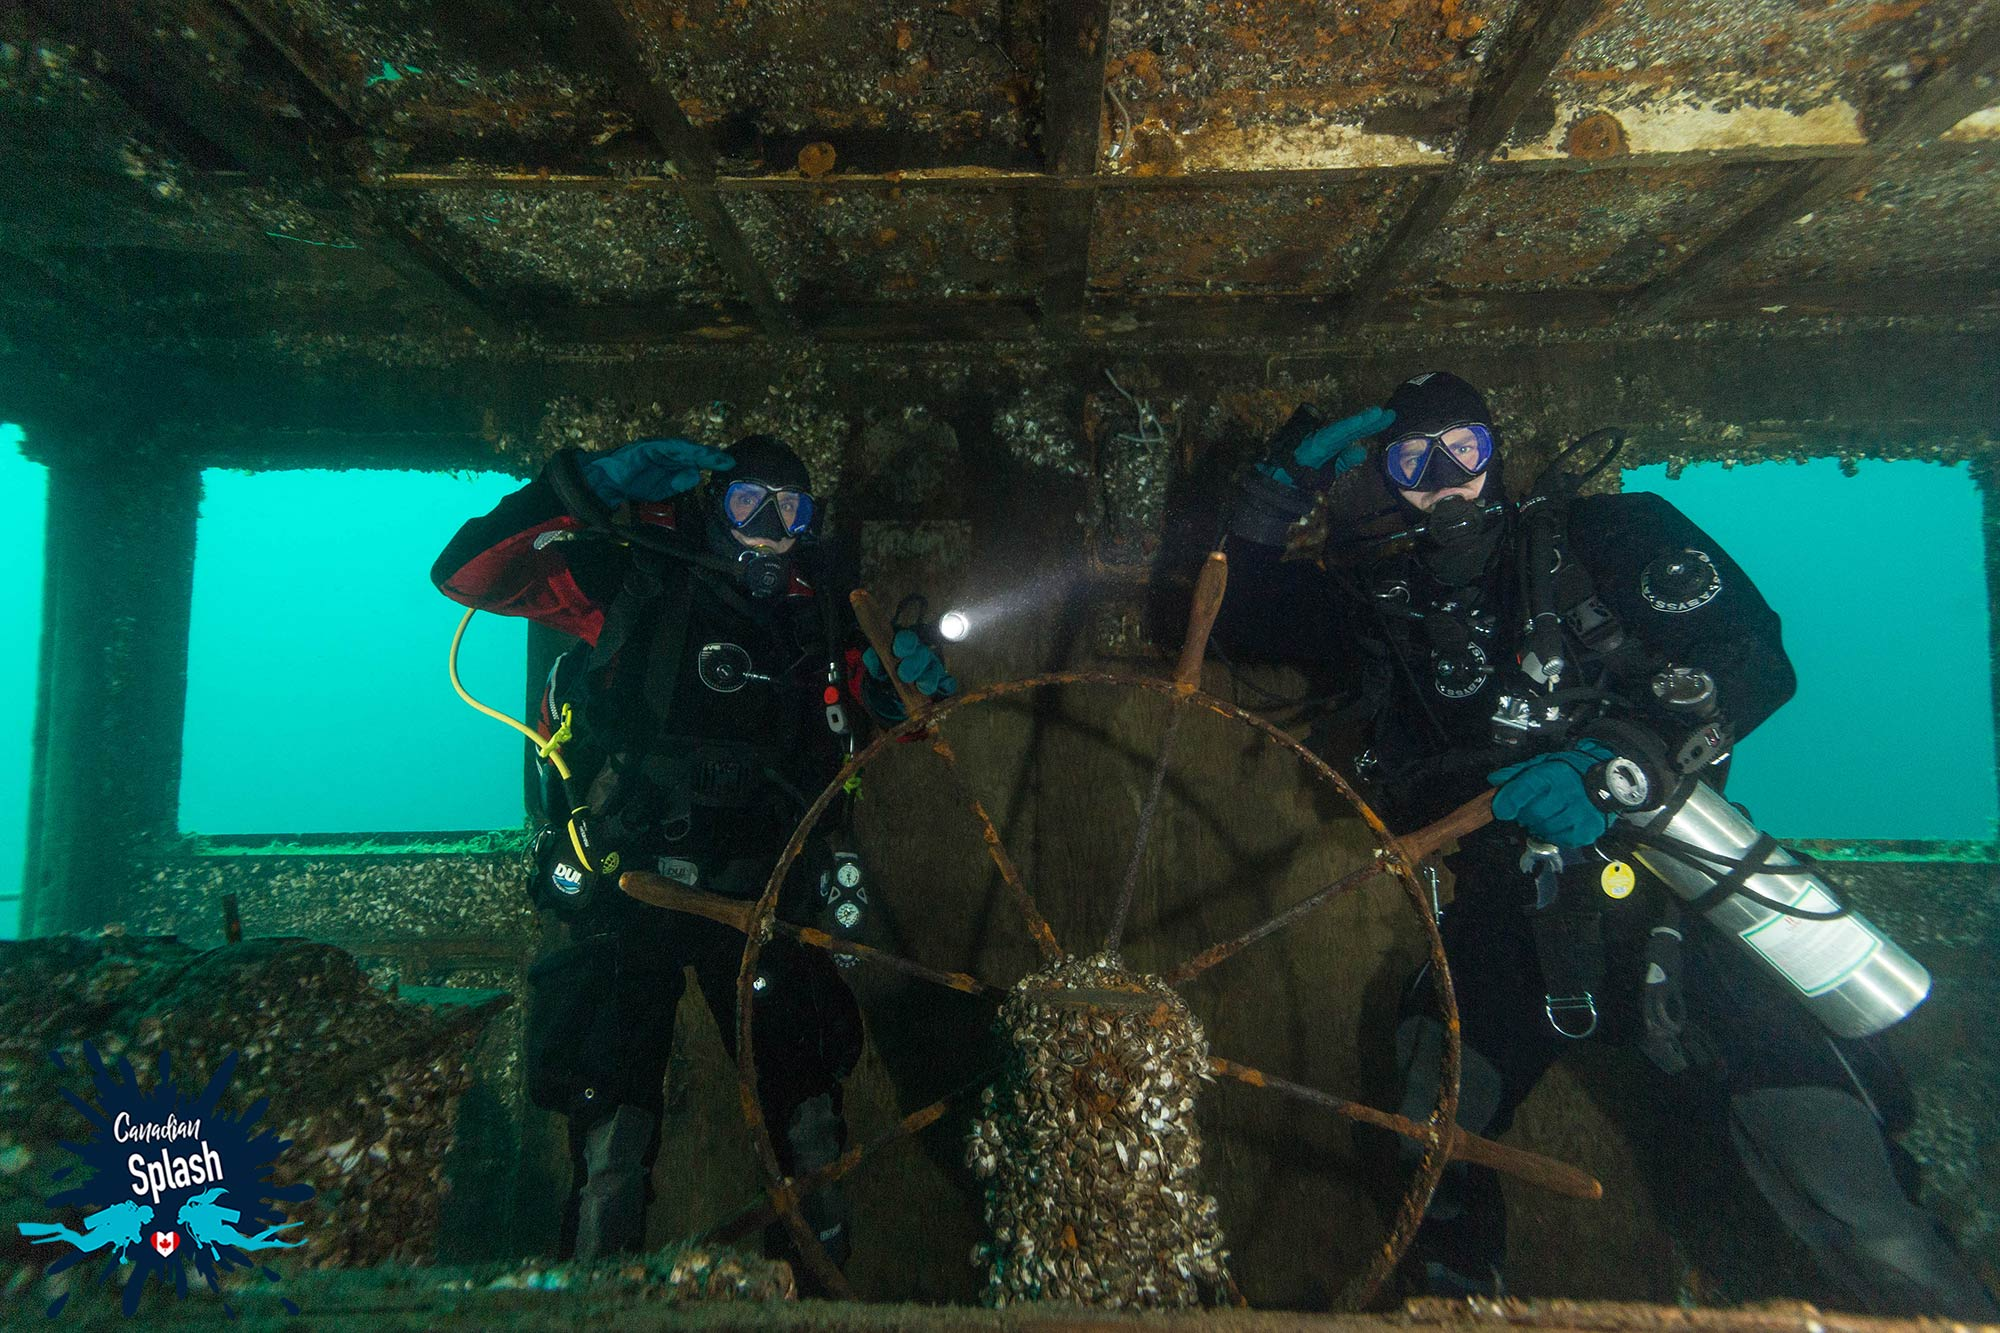 Scuba Divers Joey And Dad In The Wheelhouse Of The Niagara II Shipwreck In Tobermory, Ontario, Canada Scuba Diving